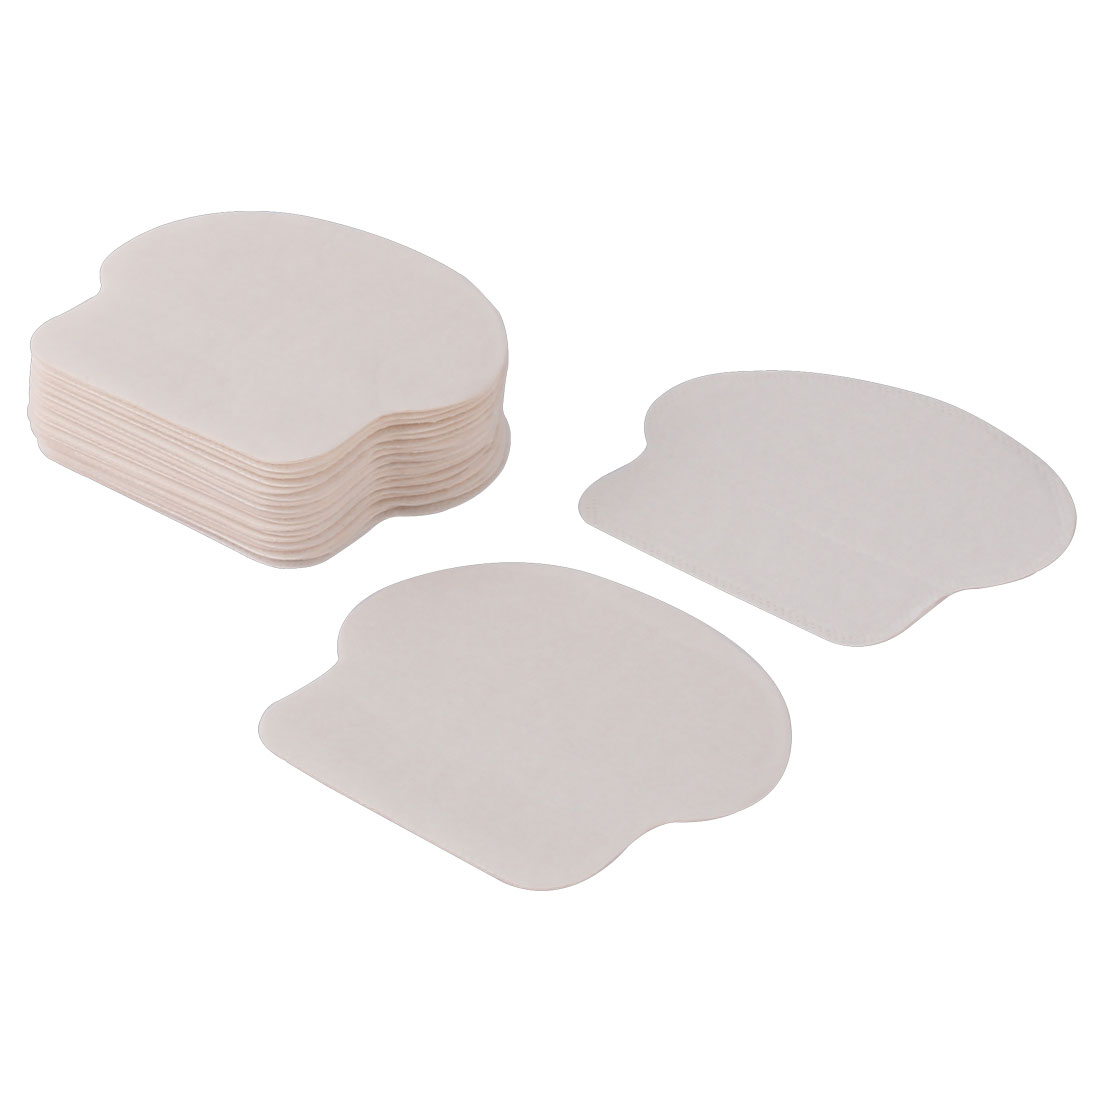 Disposable Unisex Armpit Underarm Deodorant Absorb Sweat Pad Sticker White 20pcs